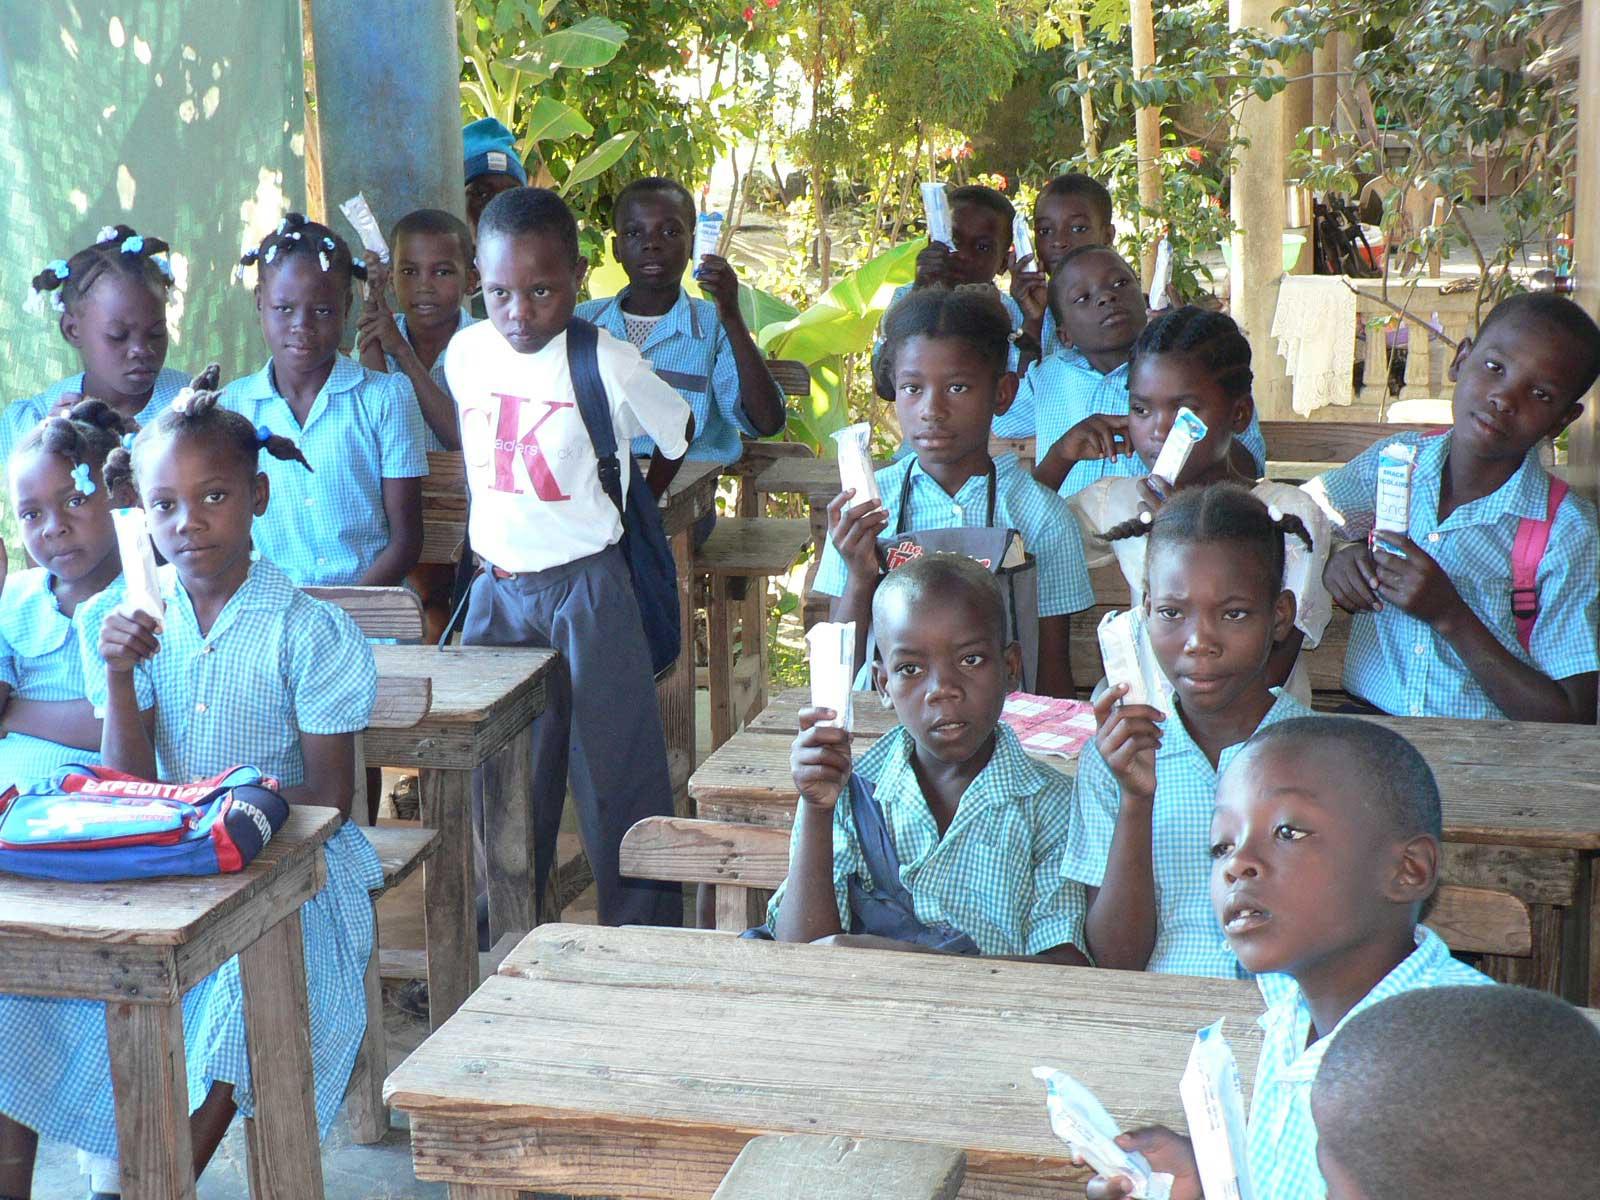 2013-09-08-Haitischool6.jpg